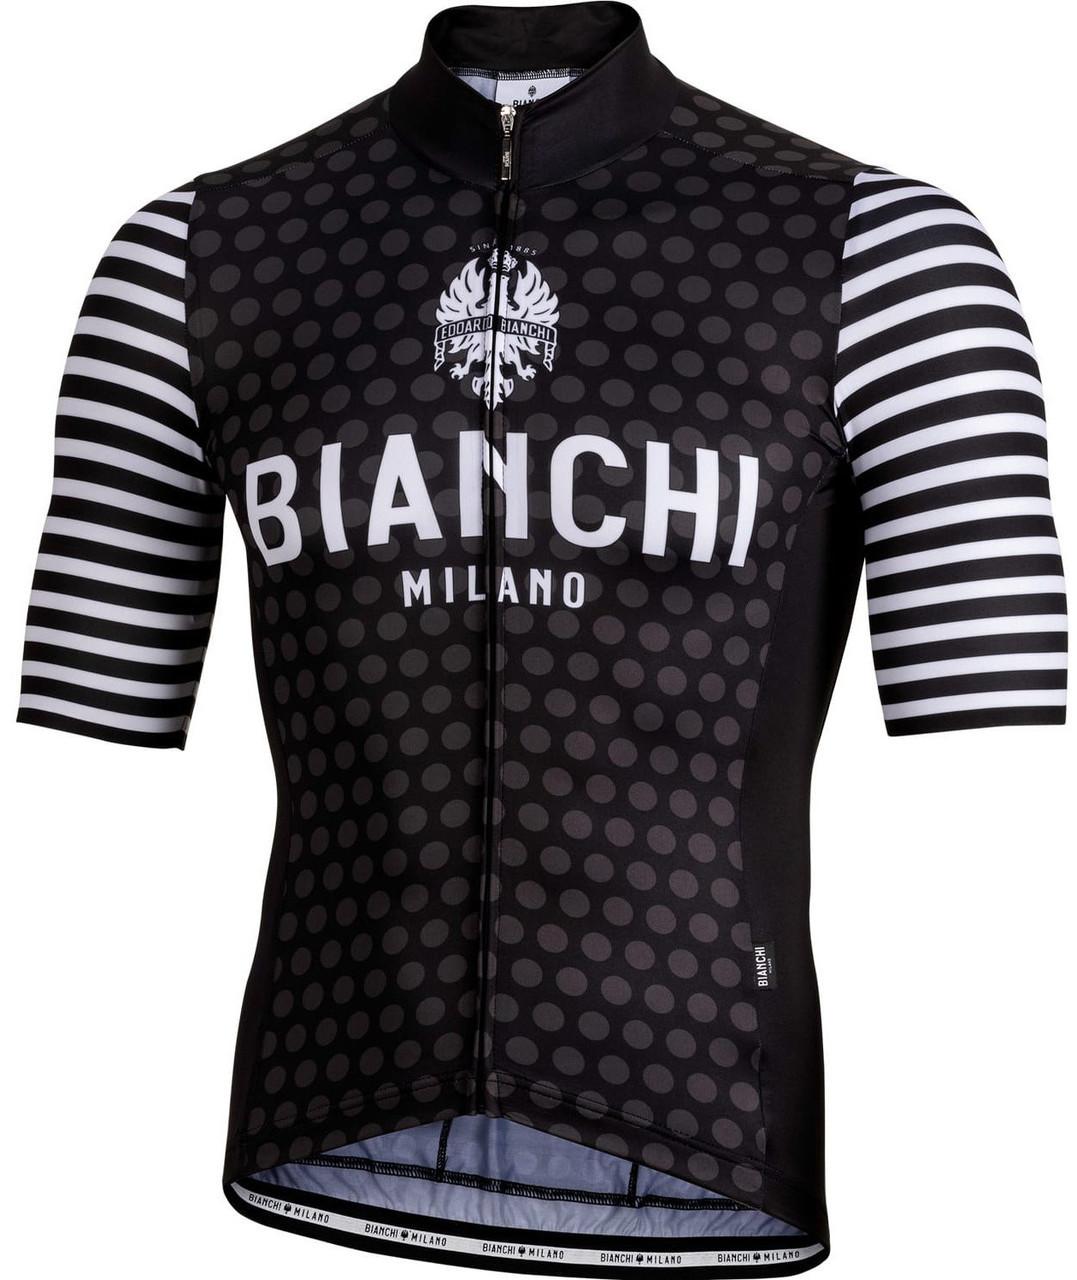 c5e9c04fa21 Bianchi Milano Davoli Black White Jersey